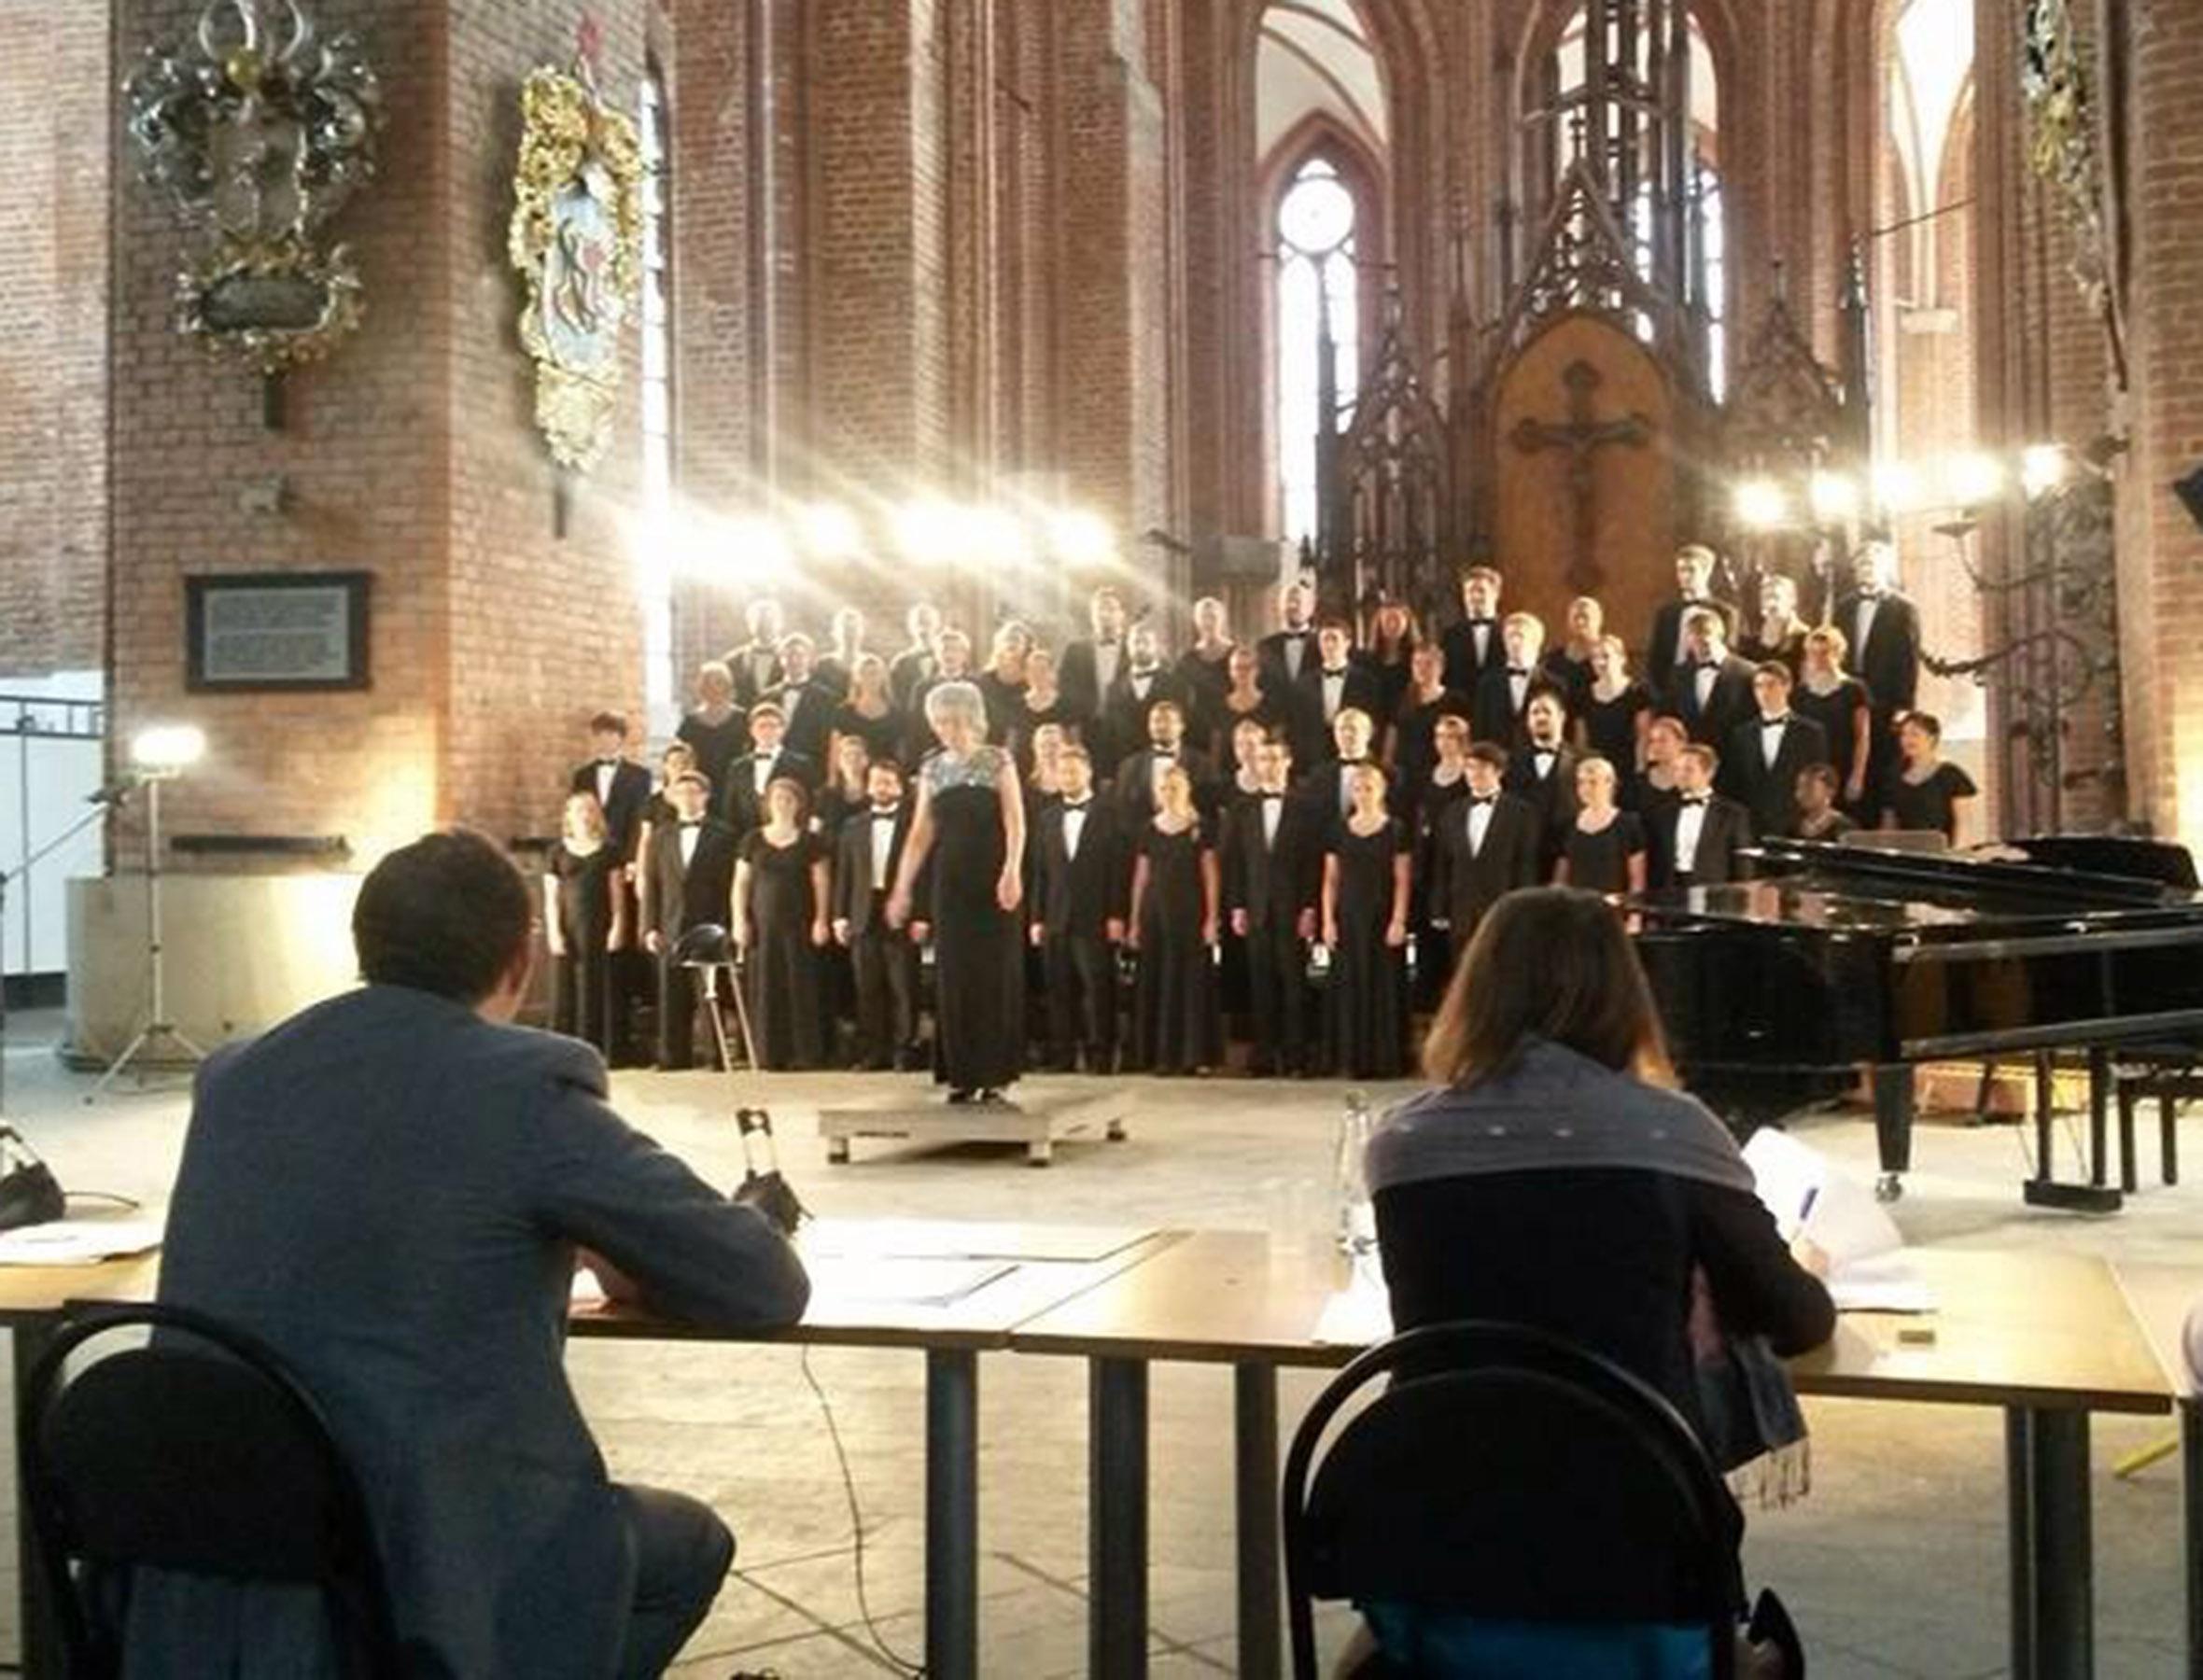 1406307738 concert choir wcg 1